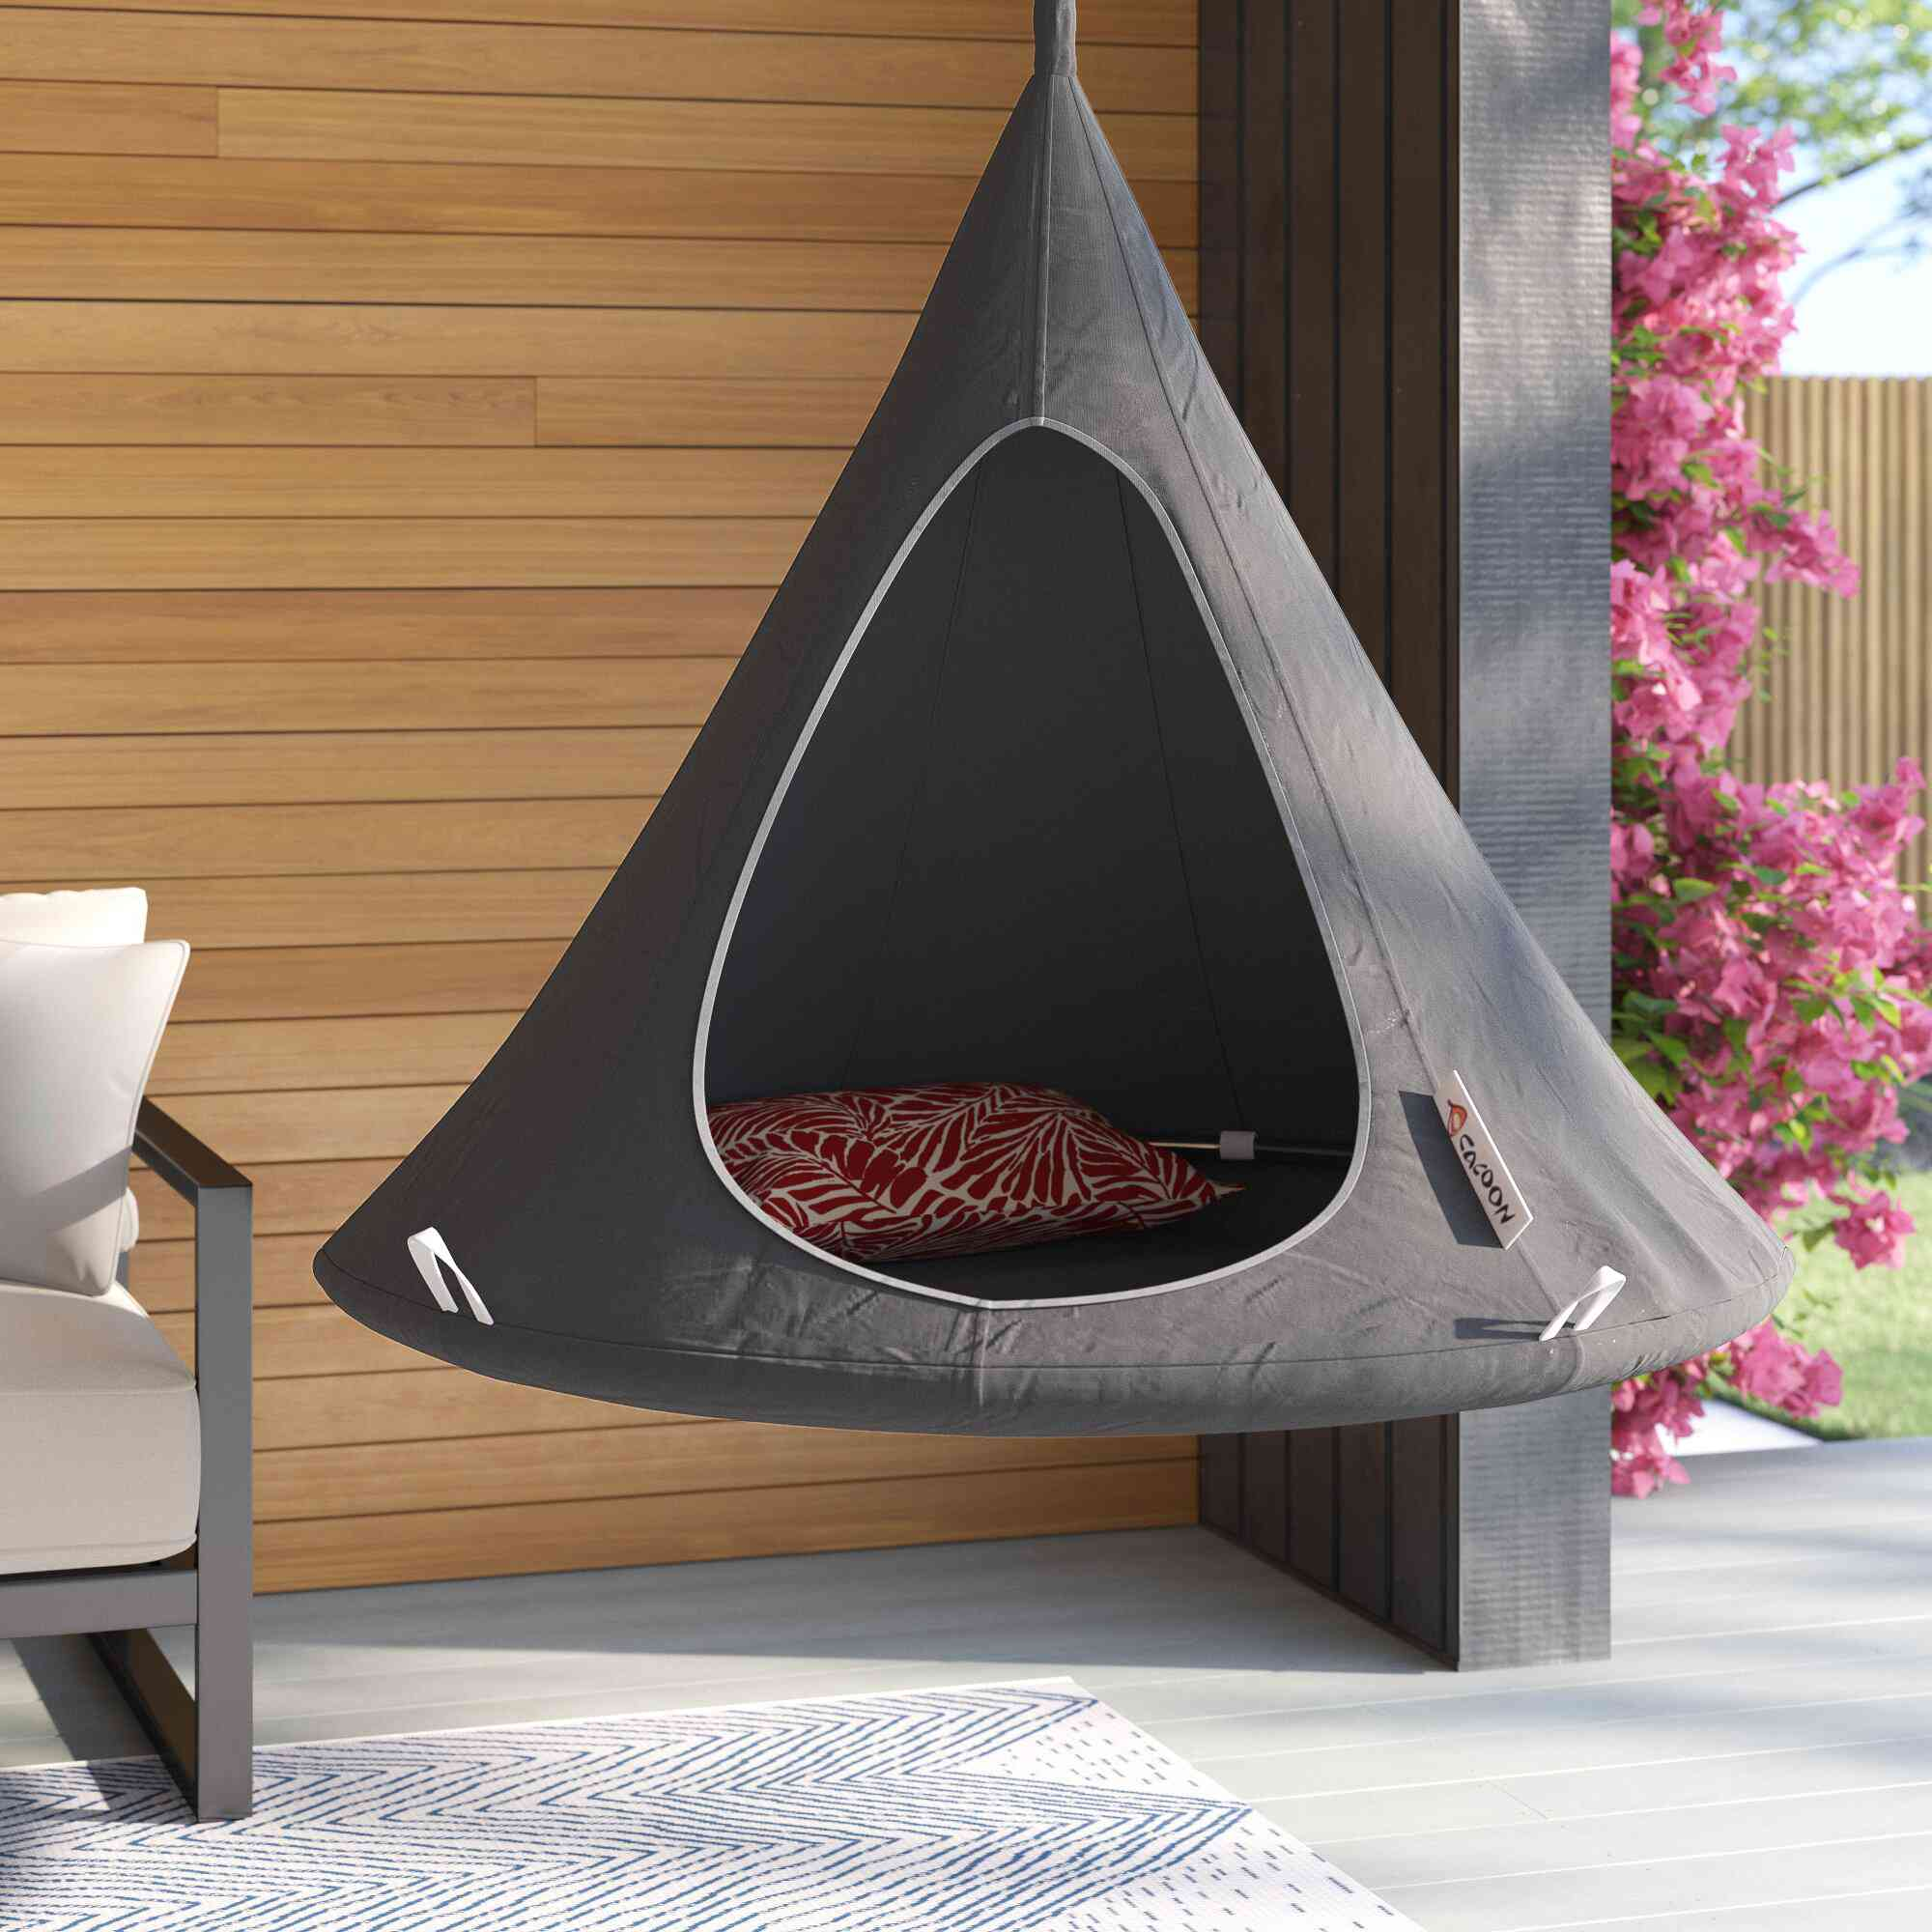 Arlmont & Co. Saffo Camping Hammock